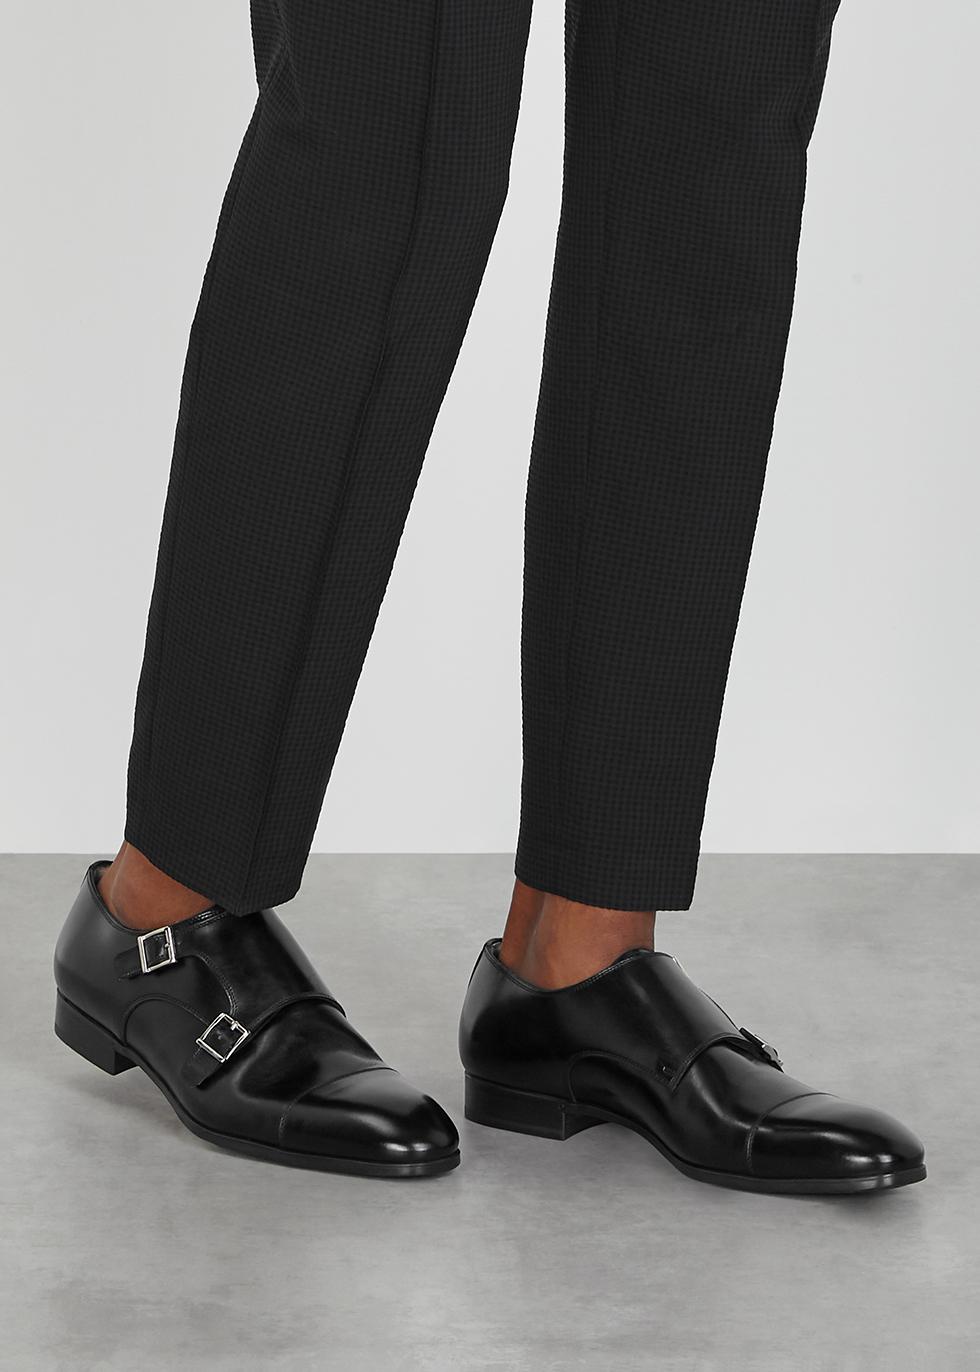 Santoni Black leather monk-strap shoes